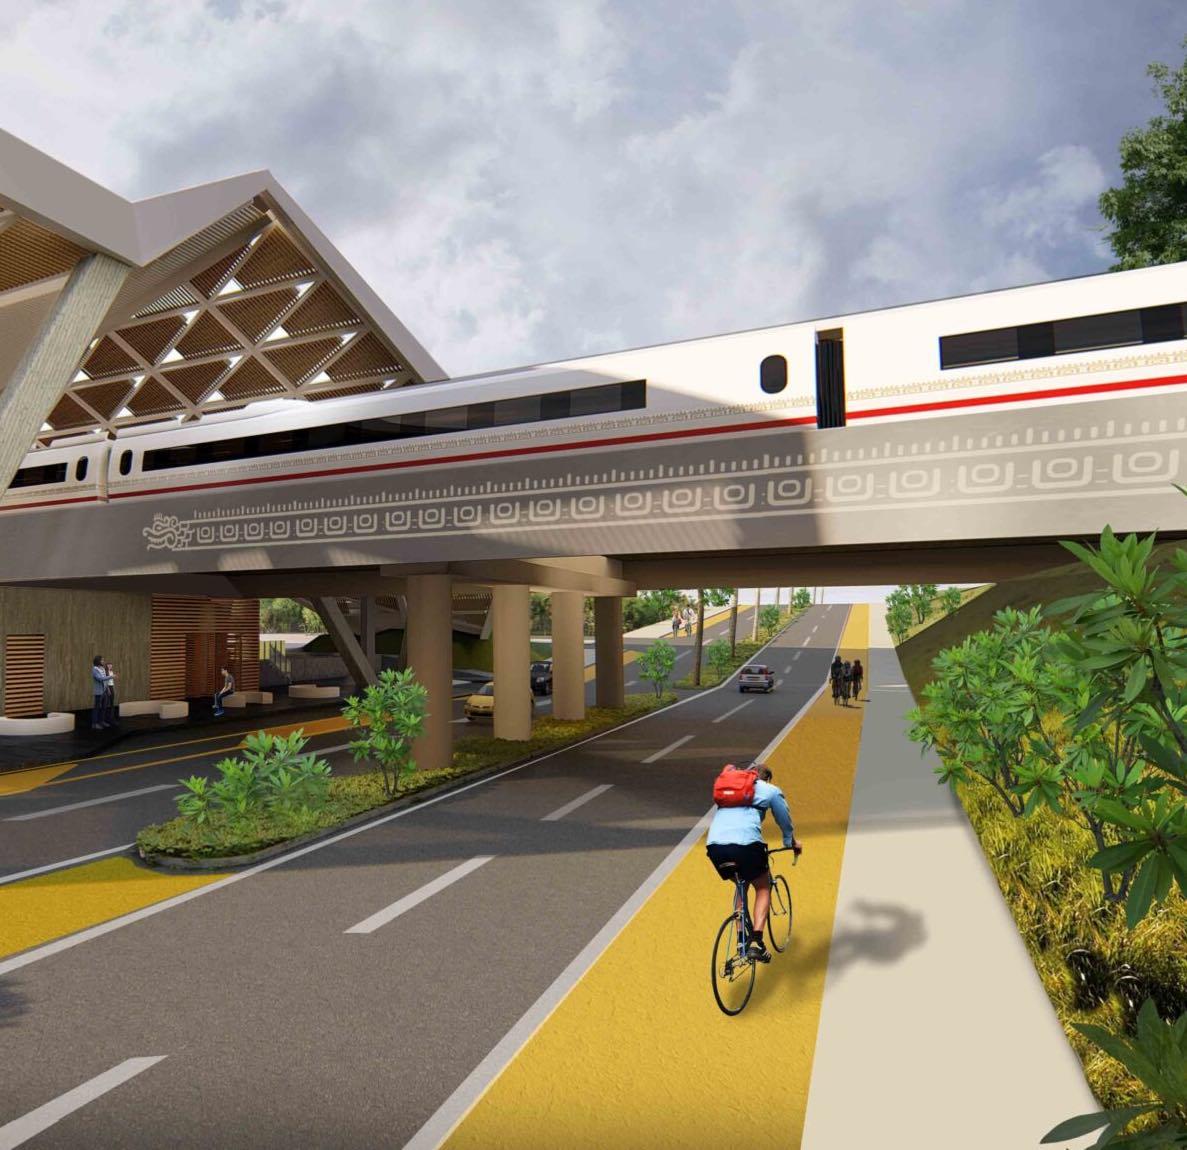 Spanish-German consortium snatches Maya train shadow operator contract